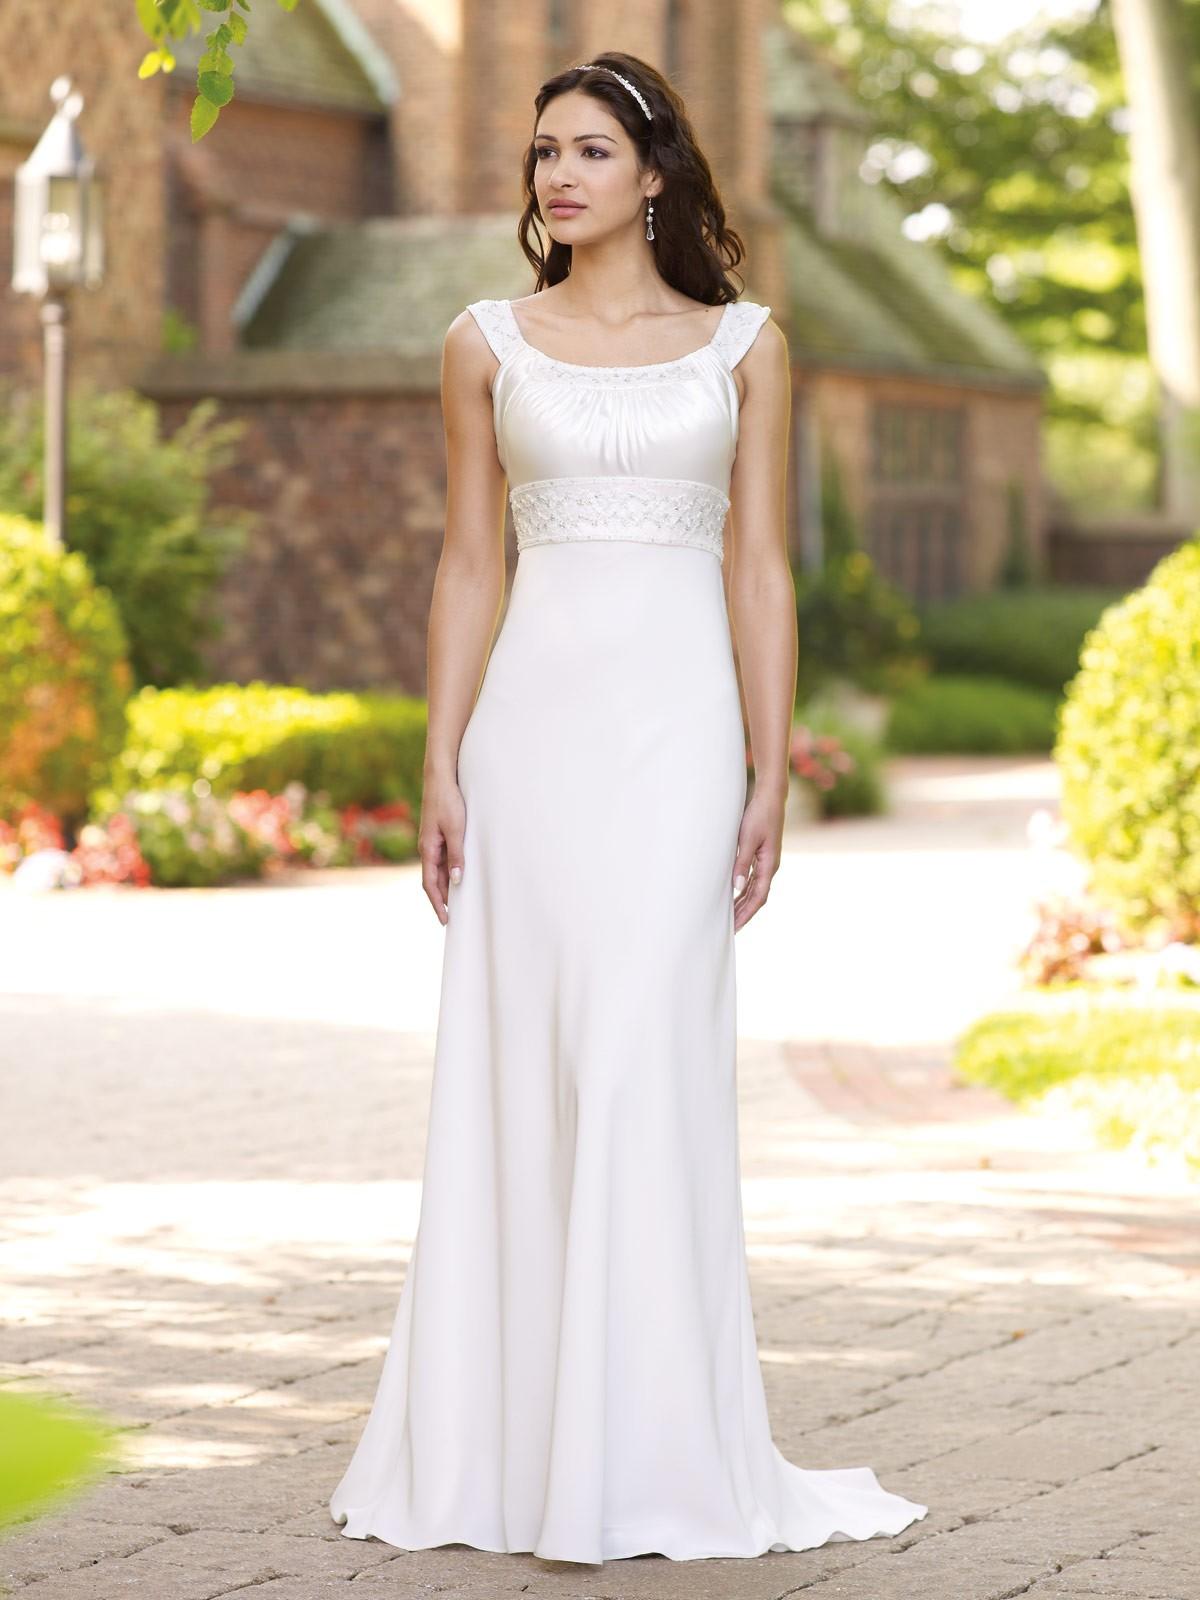 simple informal wedding dresses photo - 1